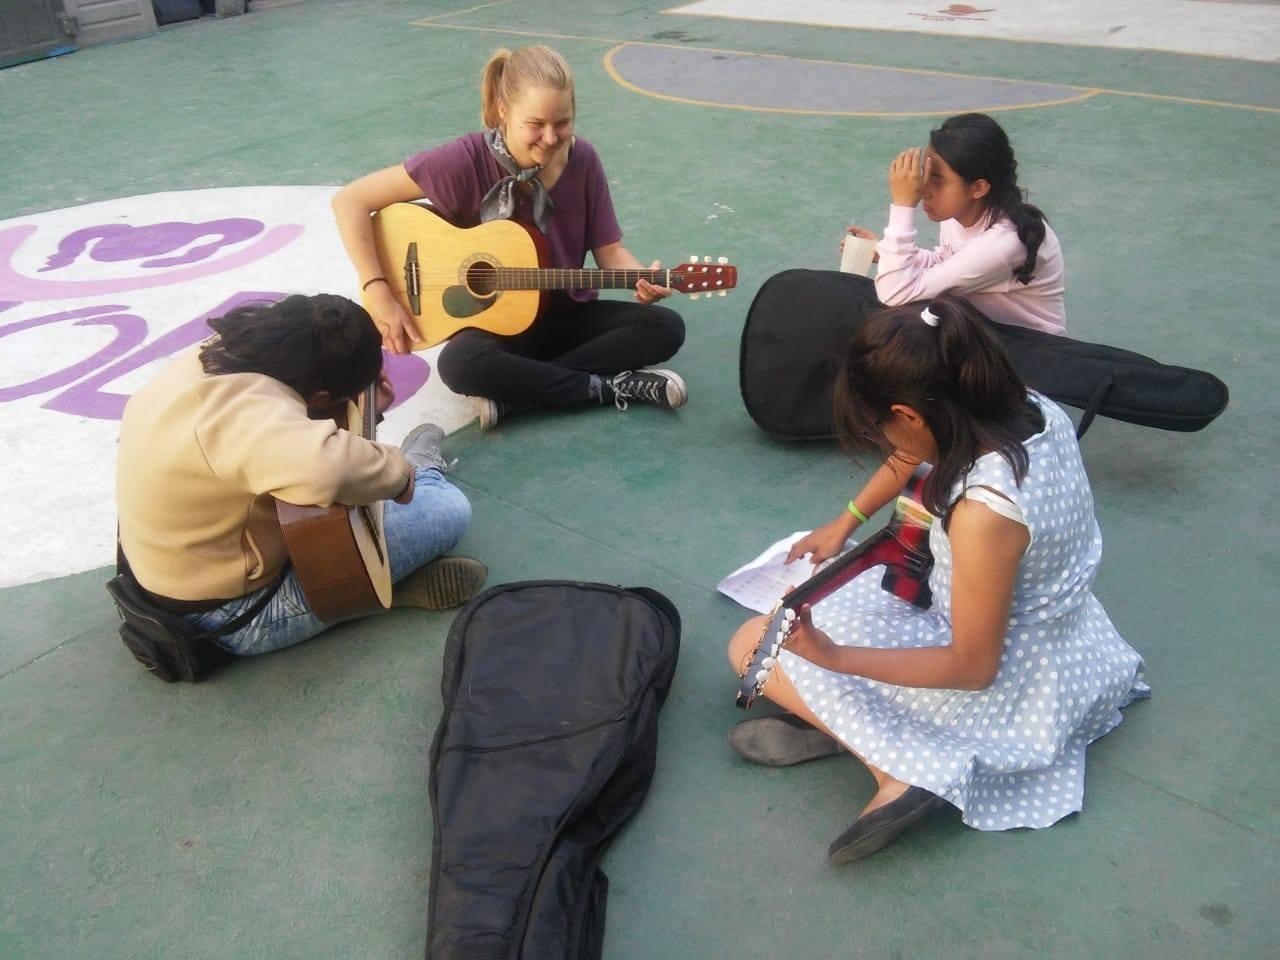 MeritMaschaHenkel_Mexiko_Gitarre_20190513_sib